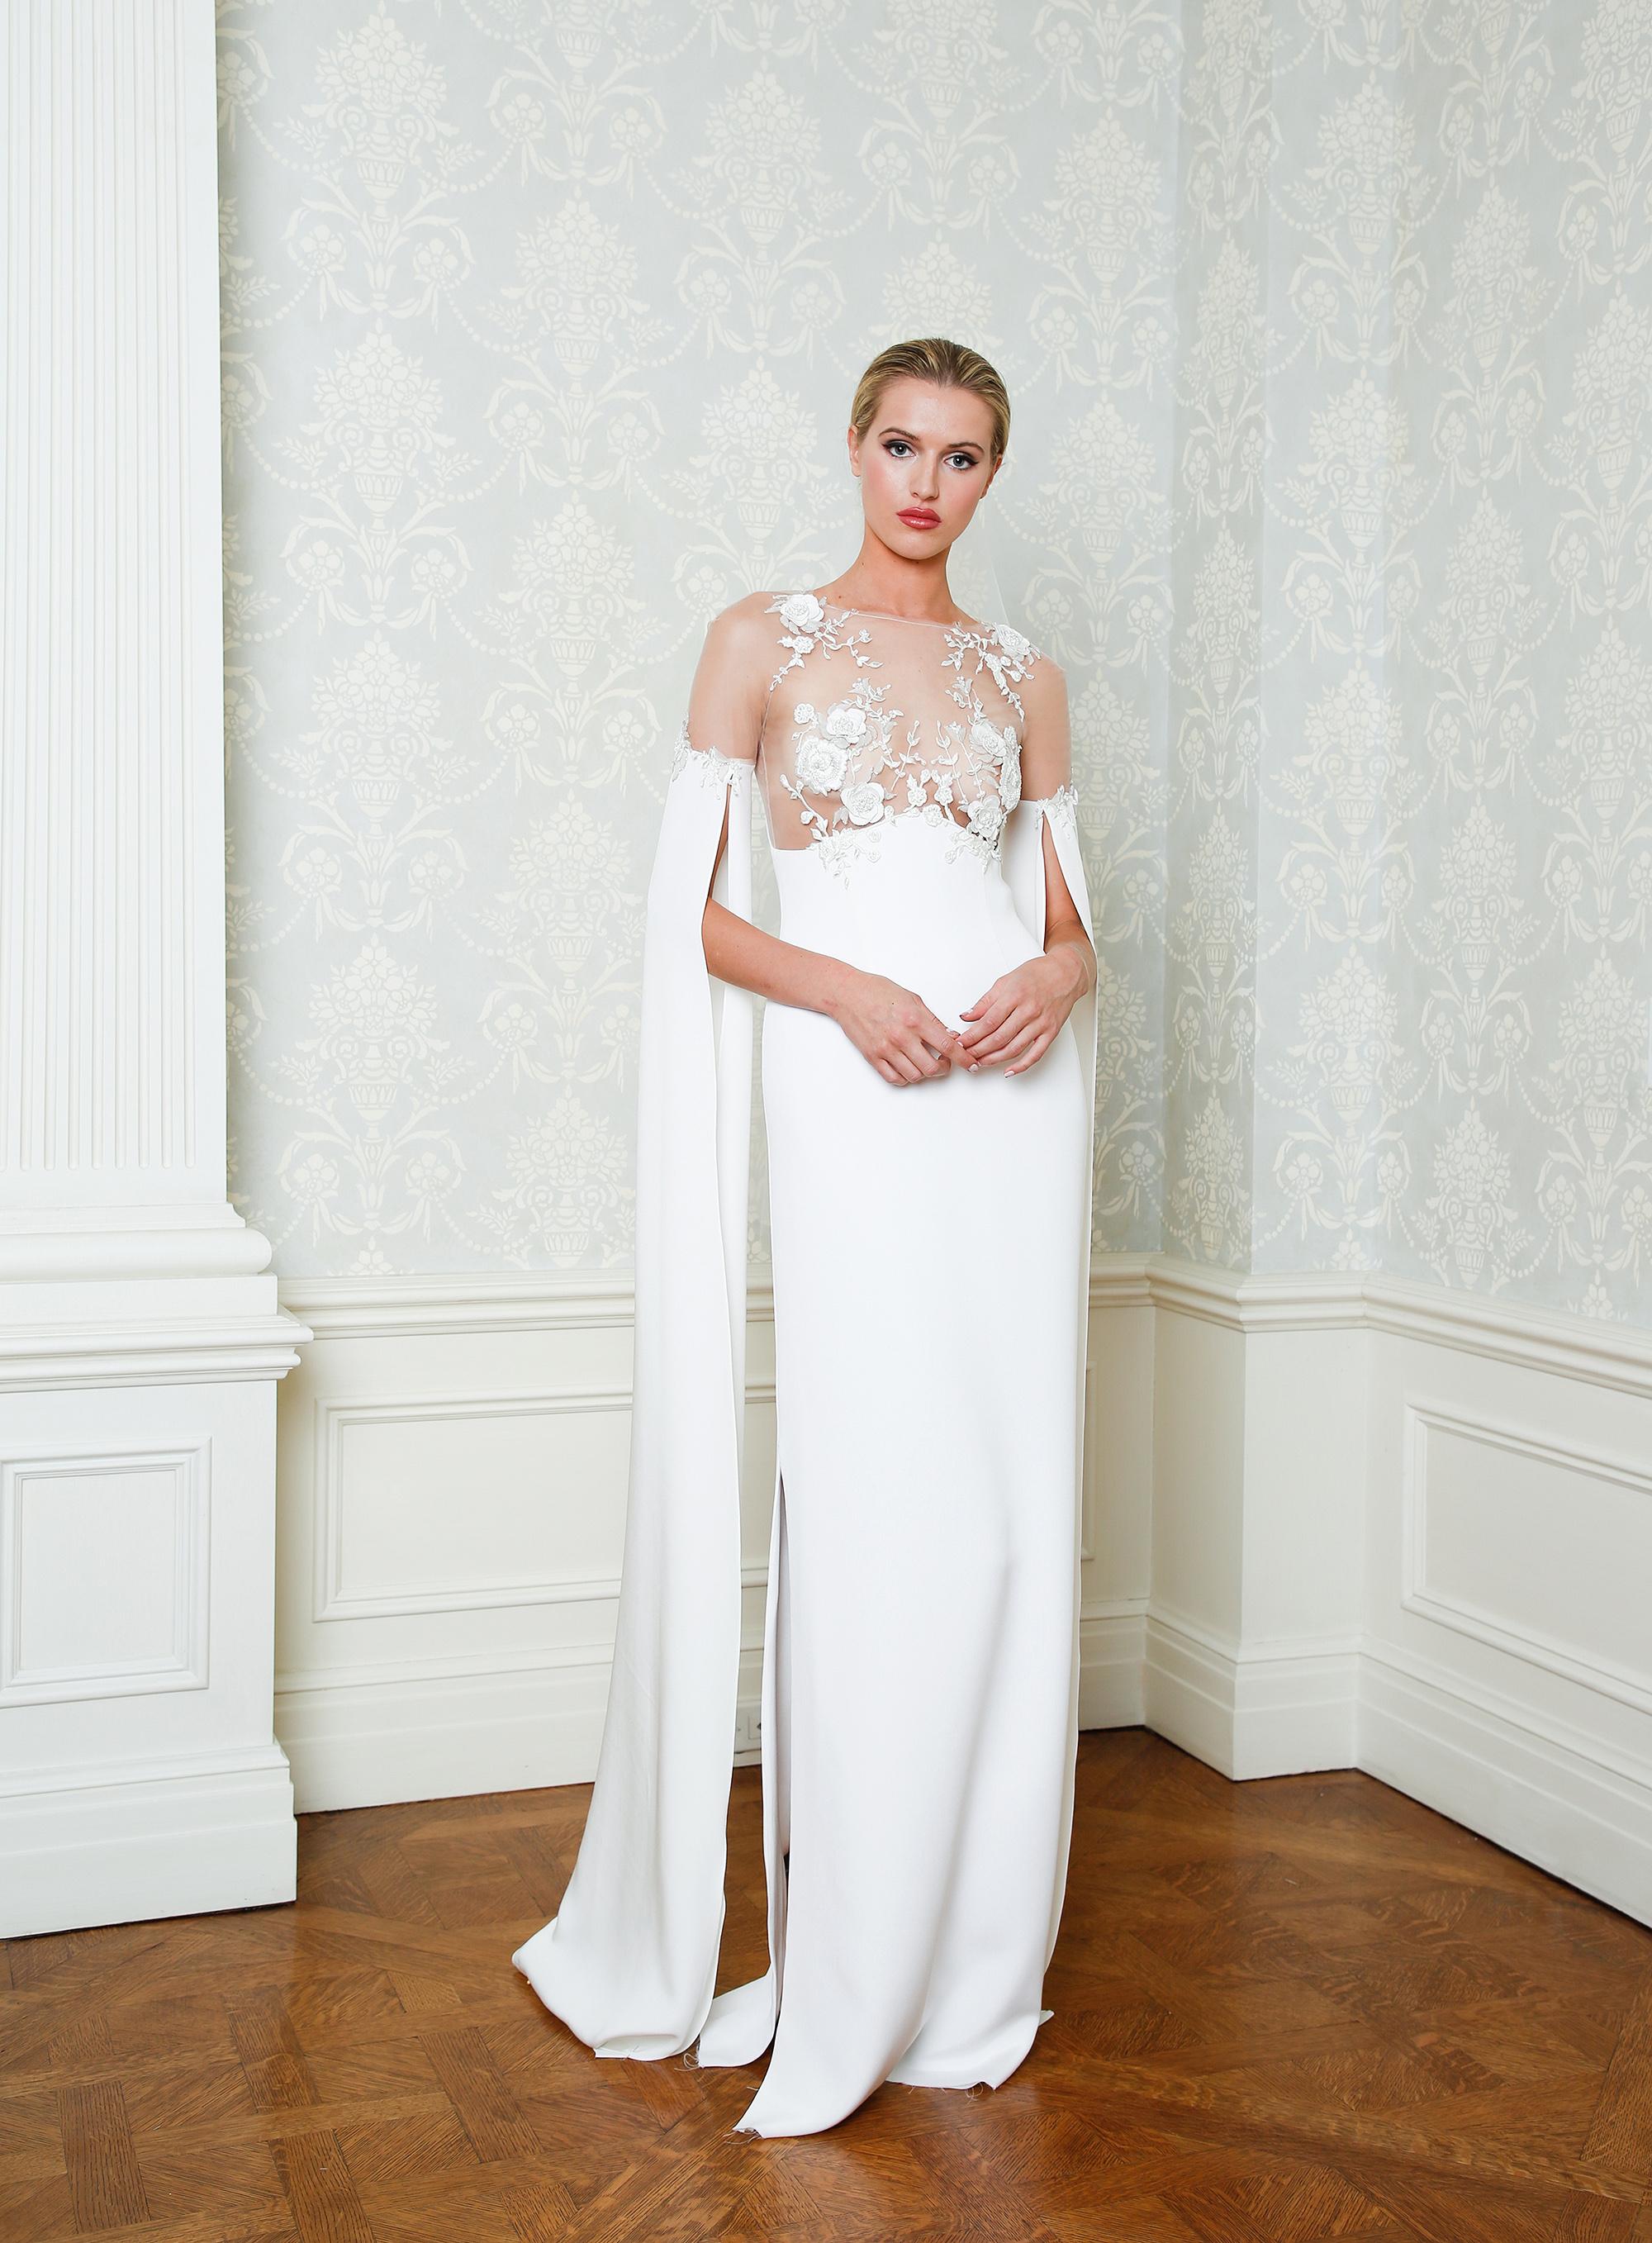 Cristina Ottaviano wedding dress spring 2019 sheer lace top sheath with skirt slit